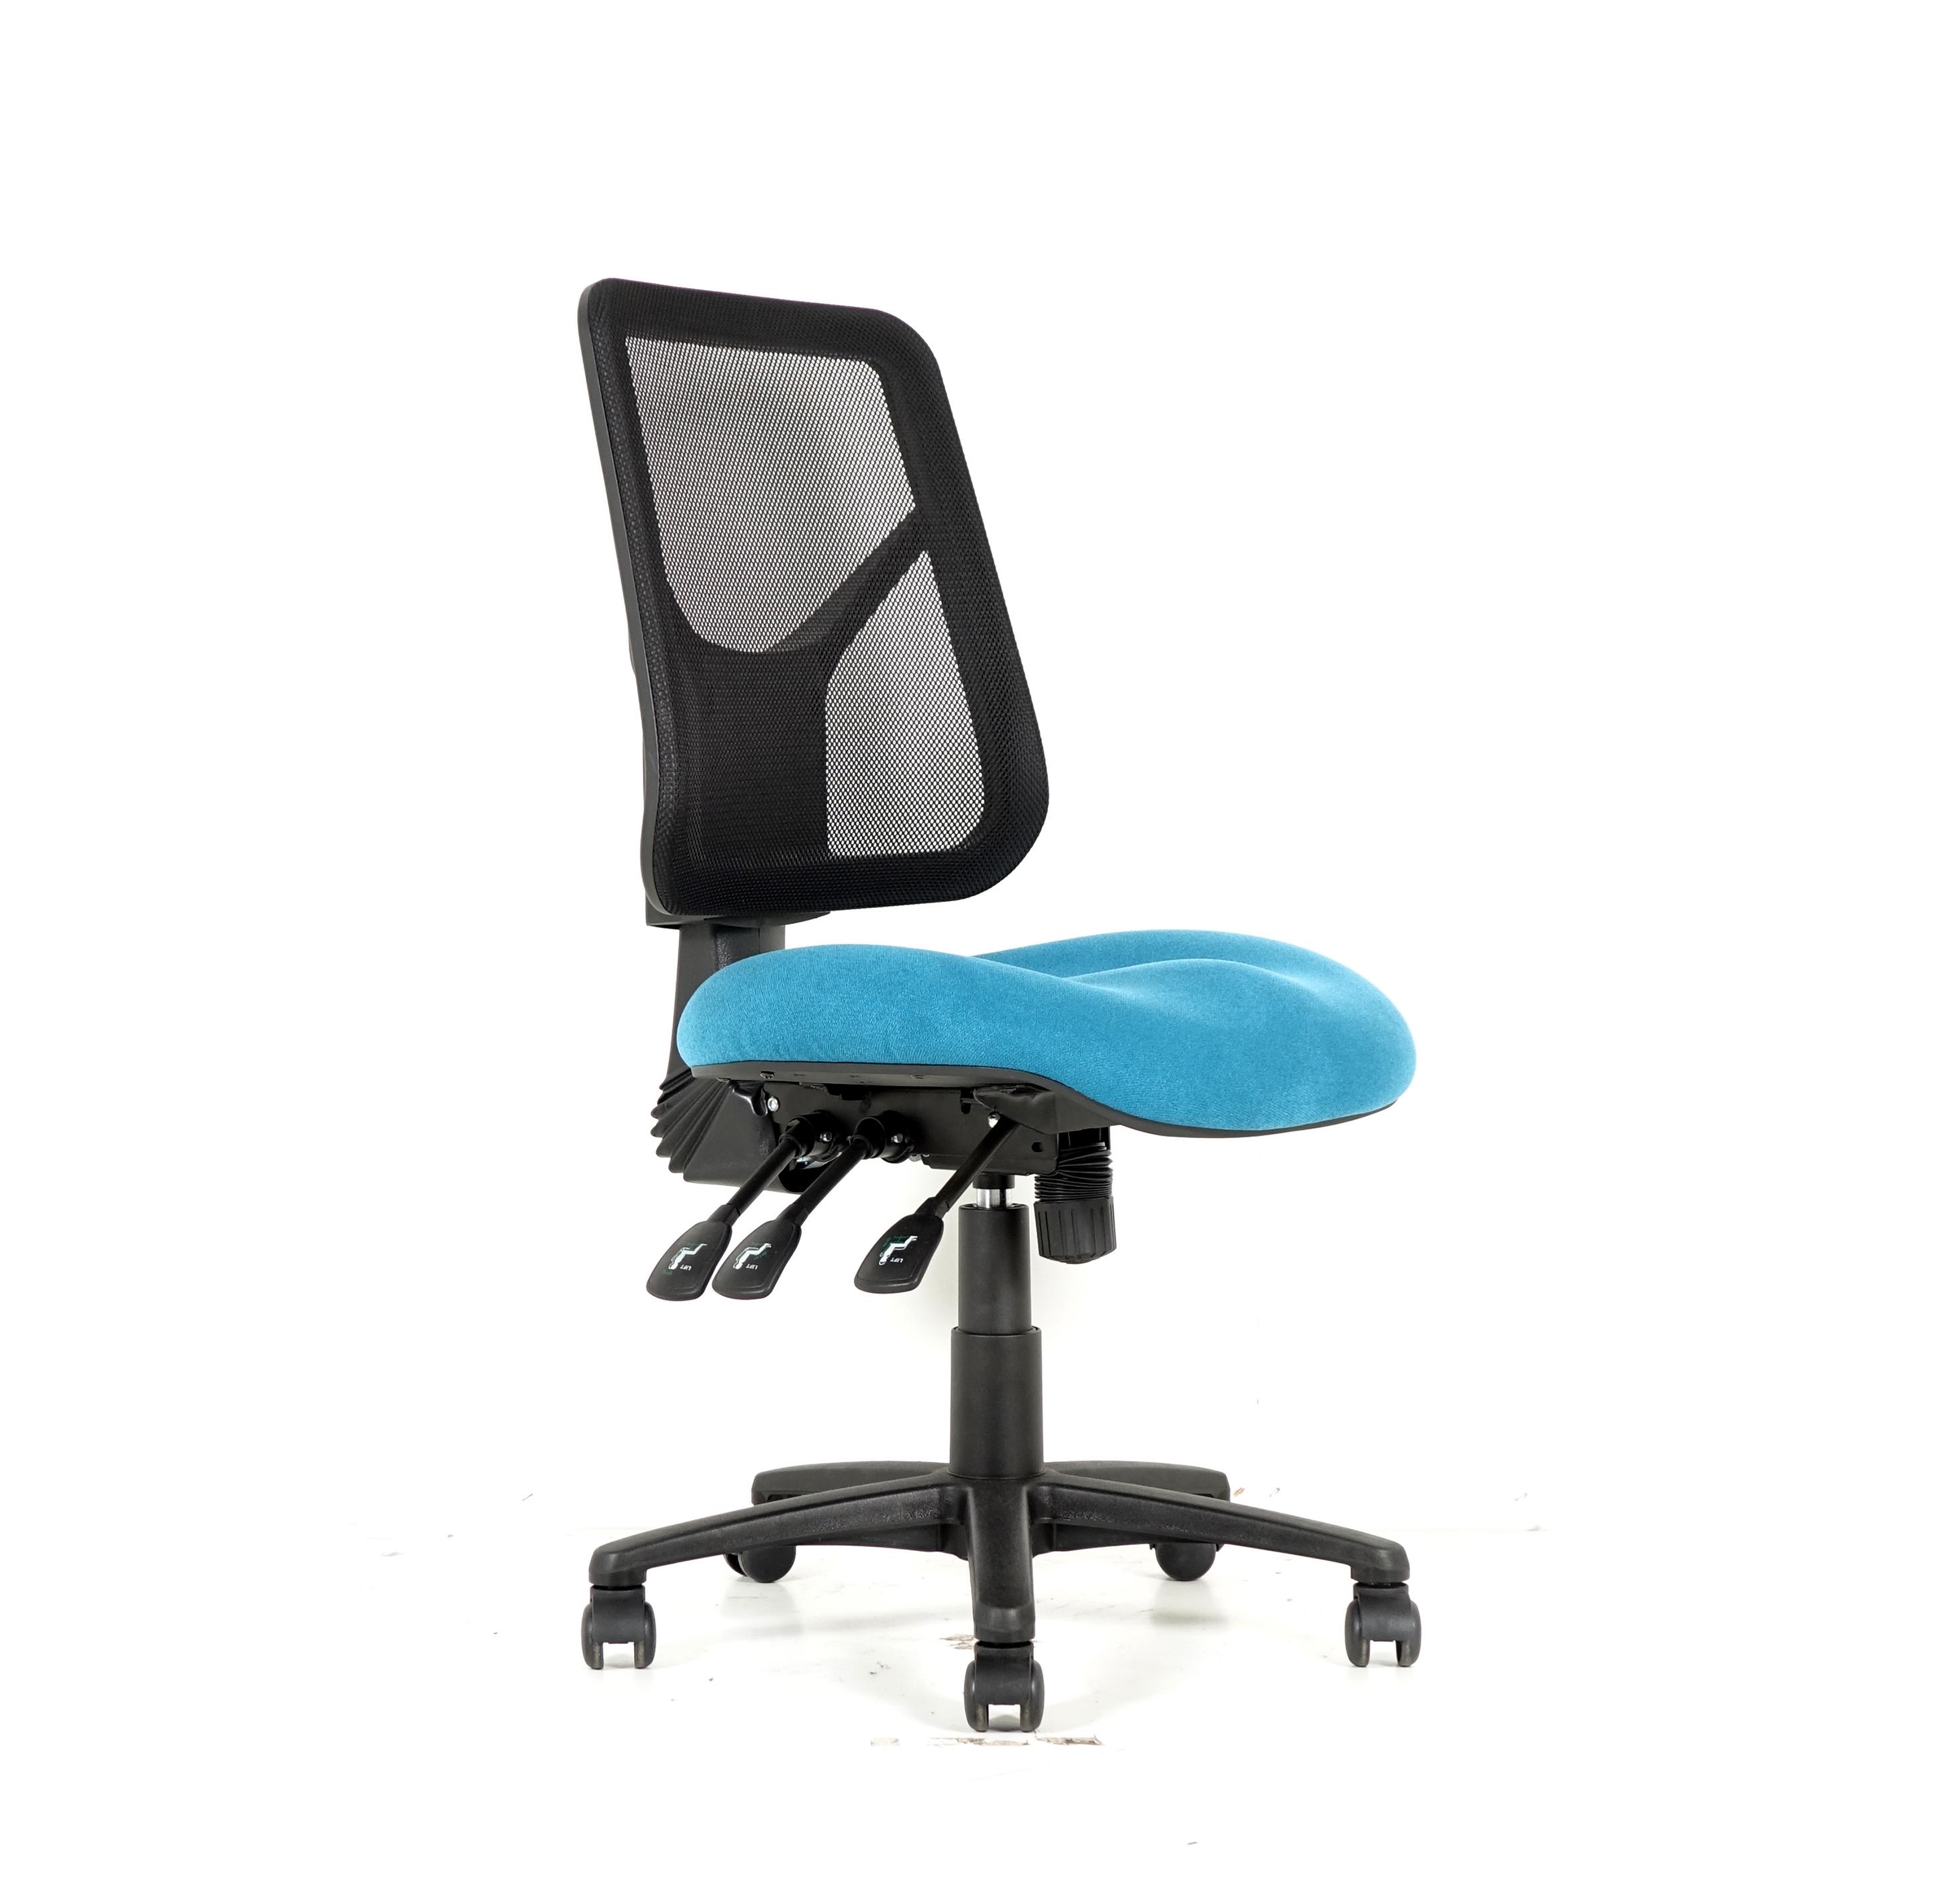 M80 High Back Typist Chair